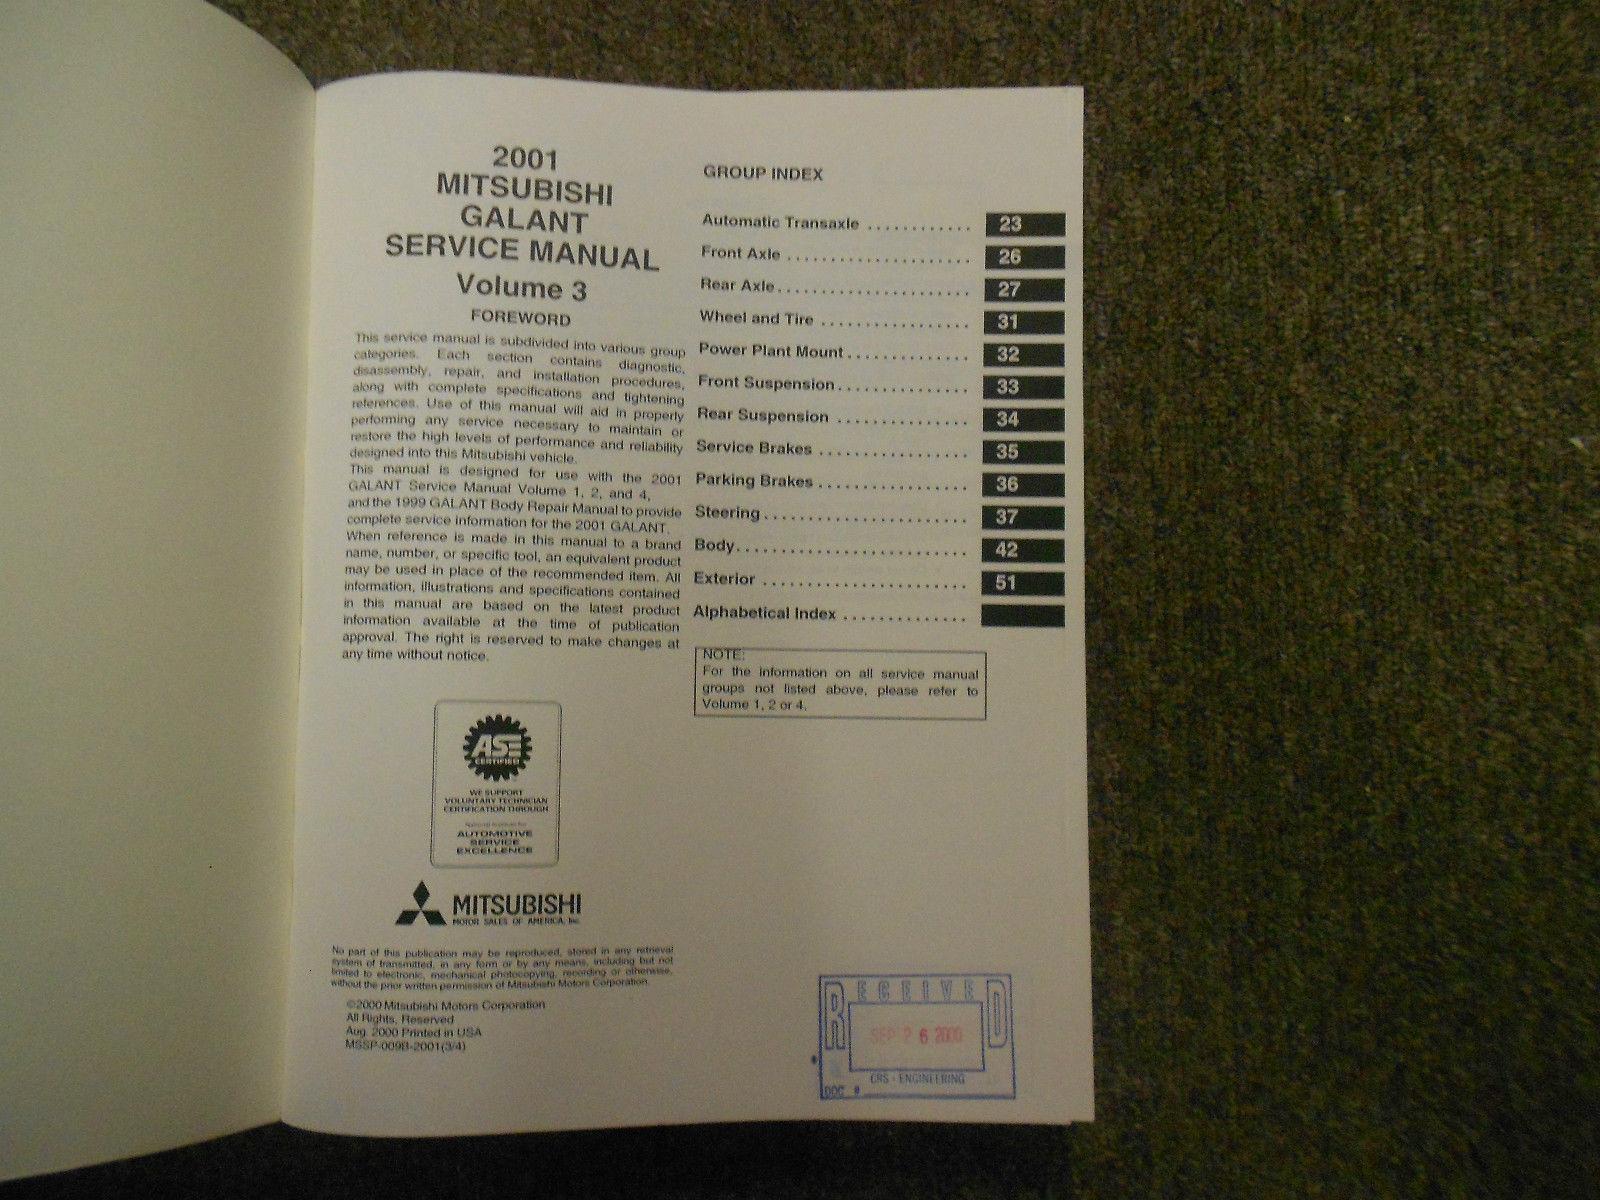 2001 MITSUBISHI Galant Service Repair Shop Manual FACTORY OEM SET BOOK x 4 VOL image 4